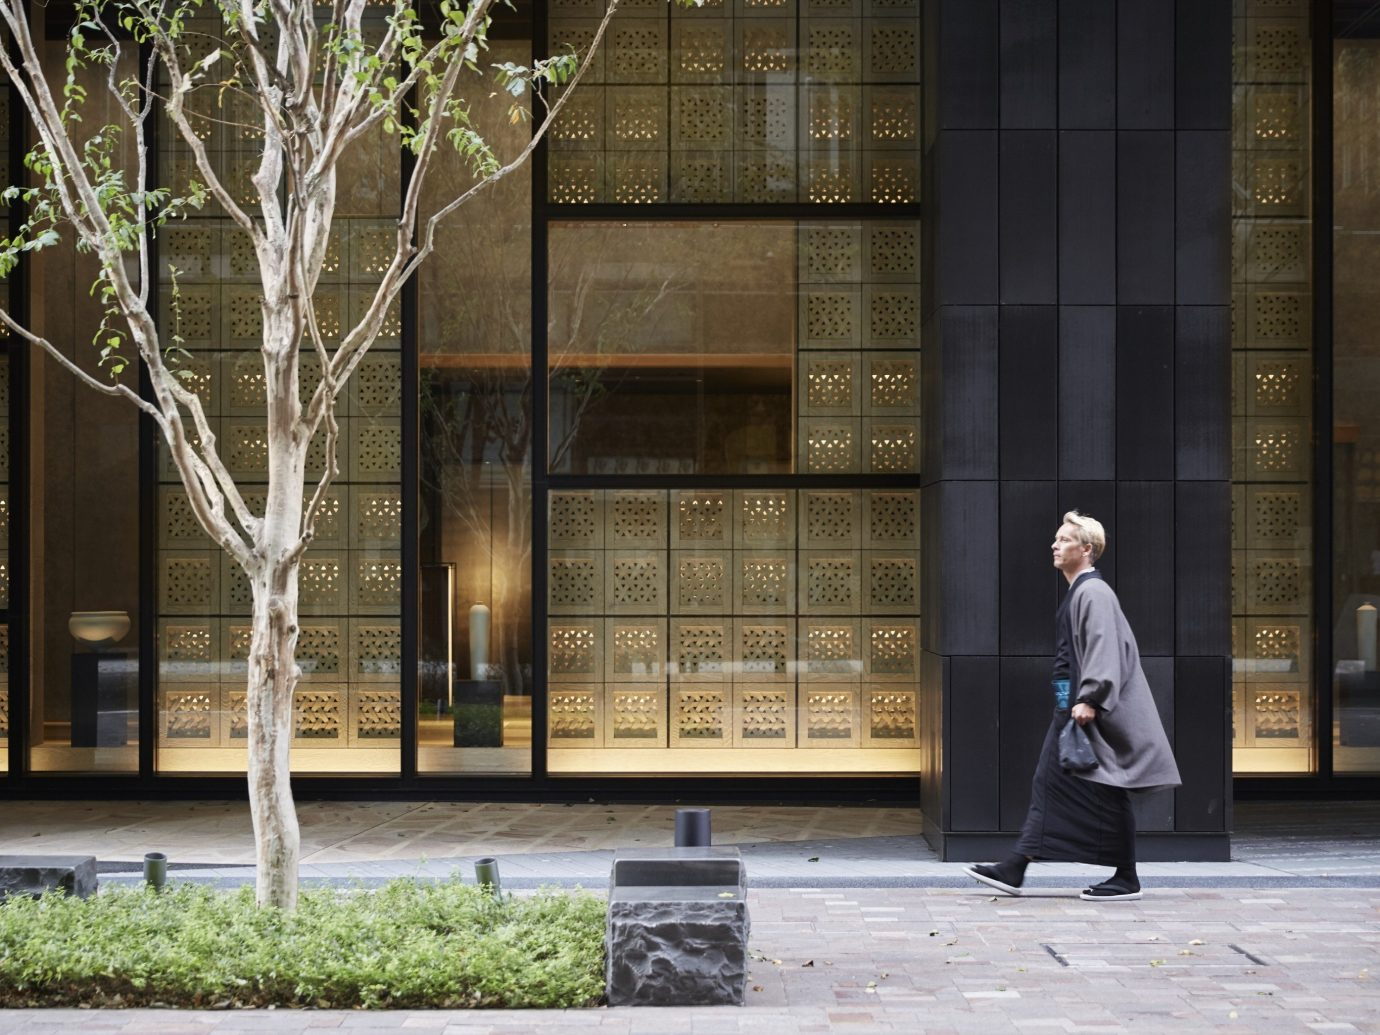 Hotels Japan Tokyo building outdoor sidewalk urban area Architecture street facade tourist attraction interior design statue